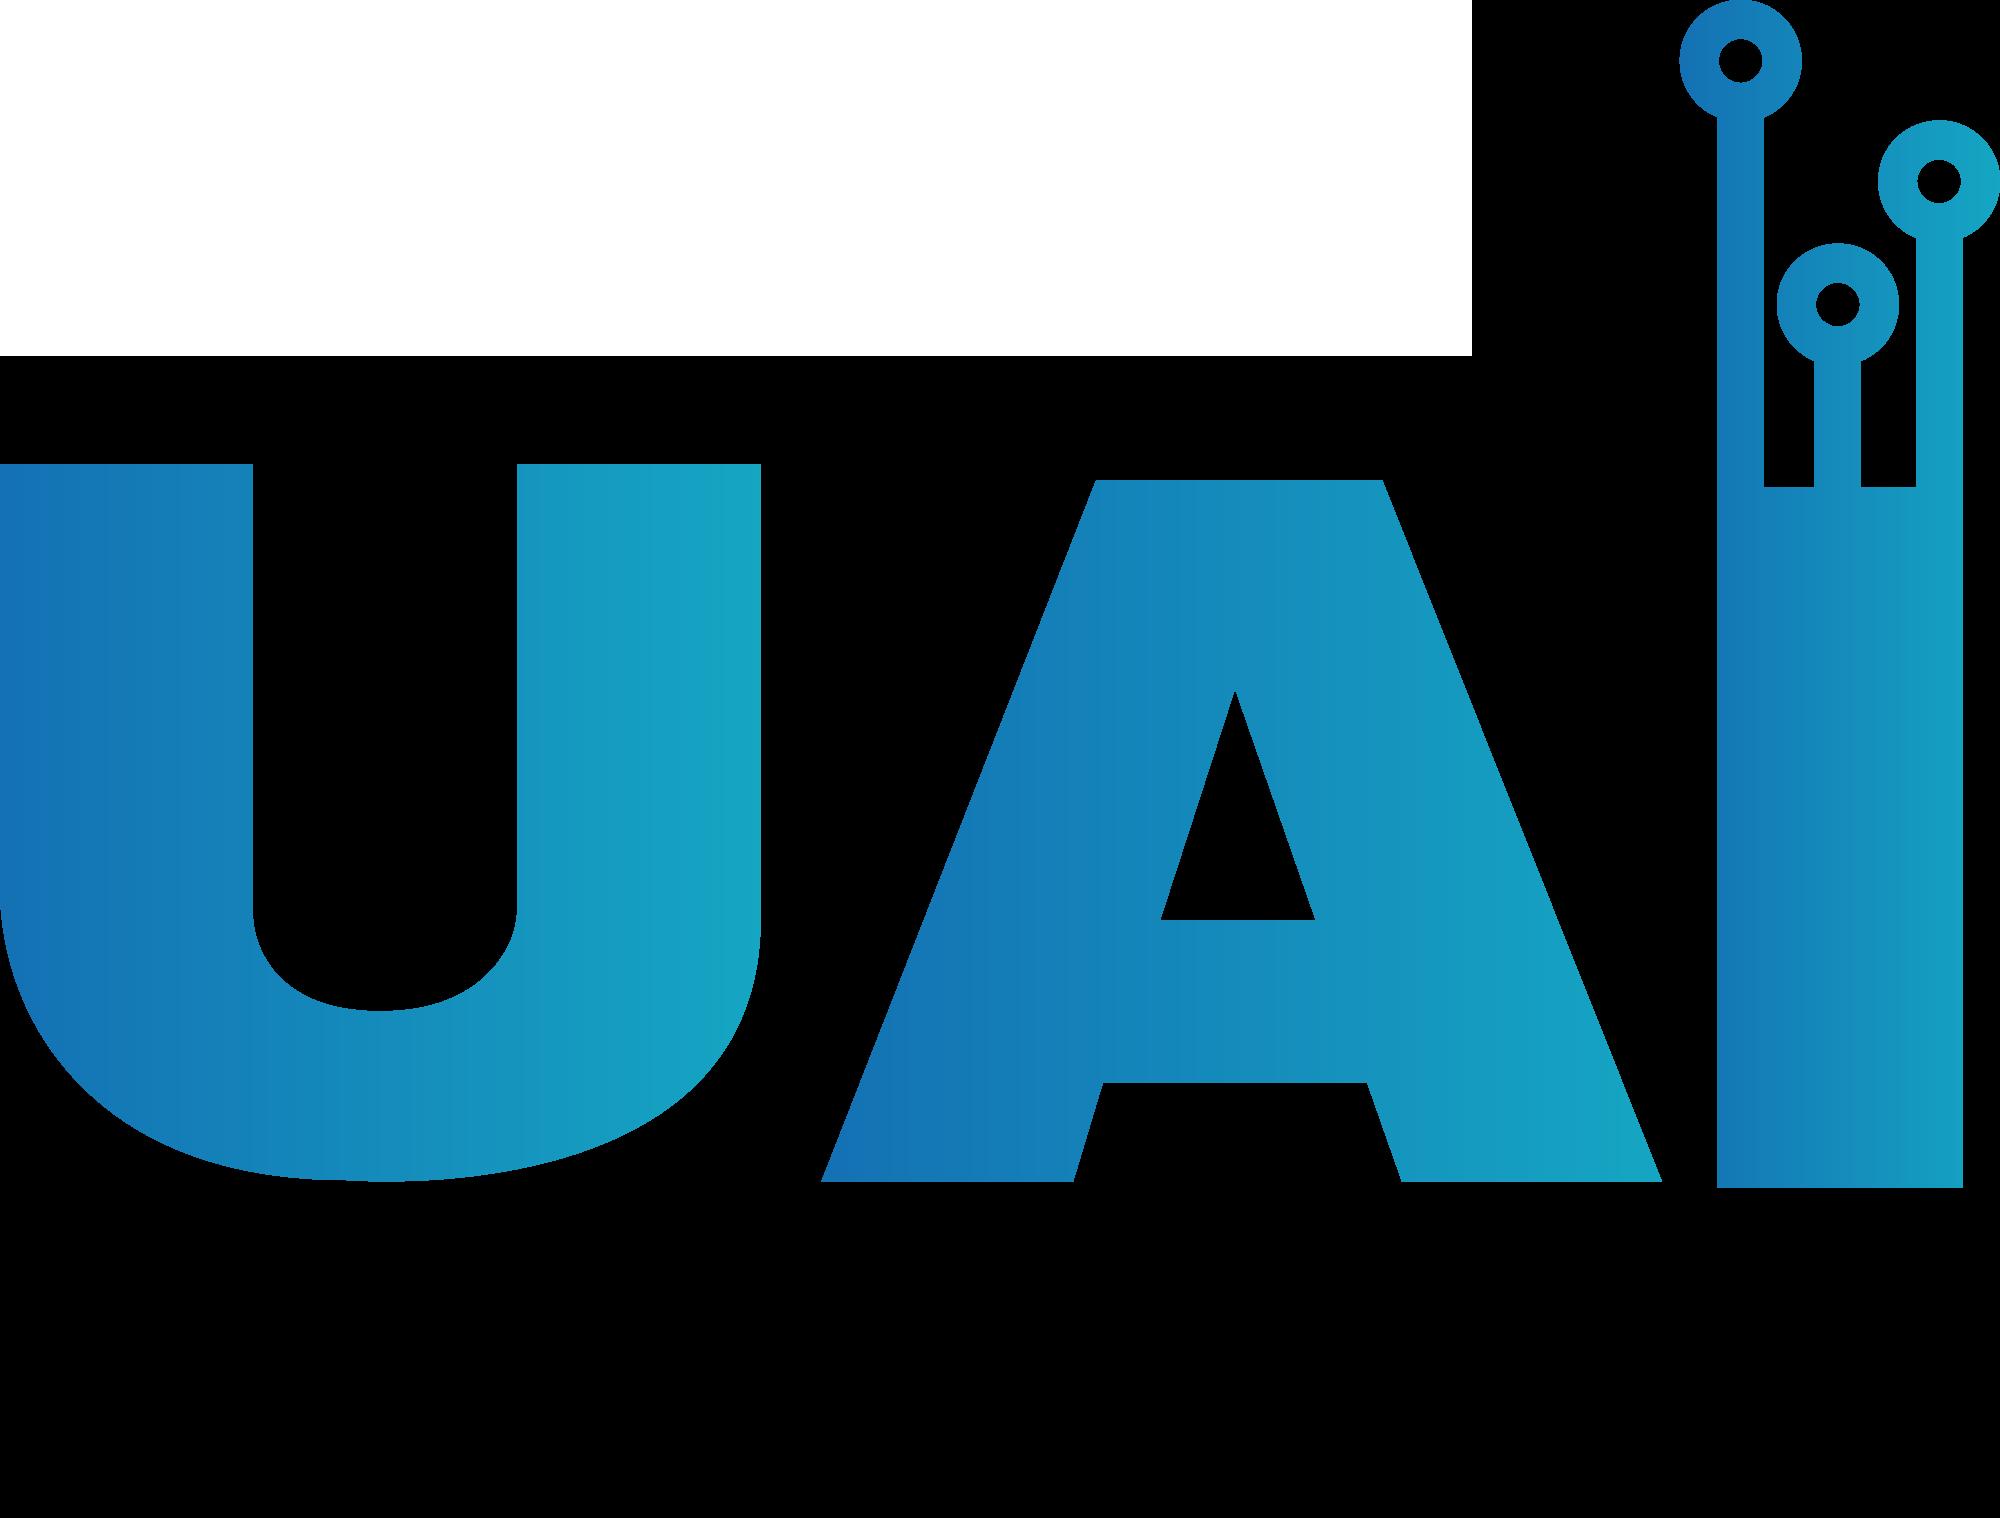 Logo Uai Fibra Net